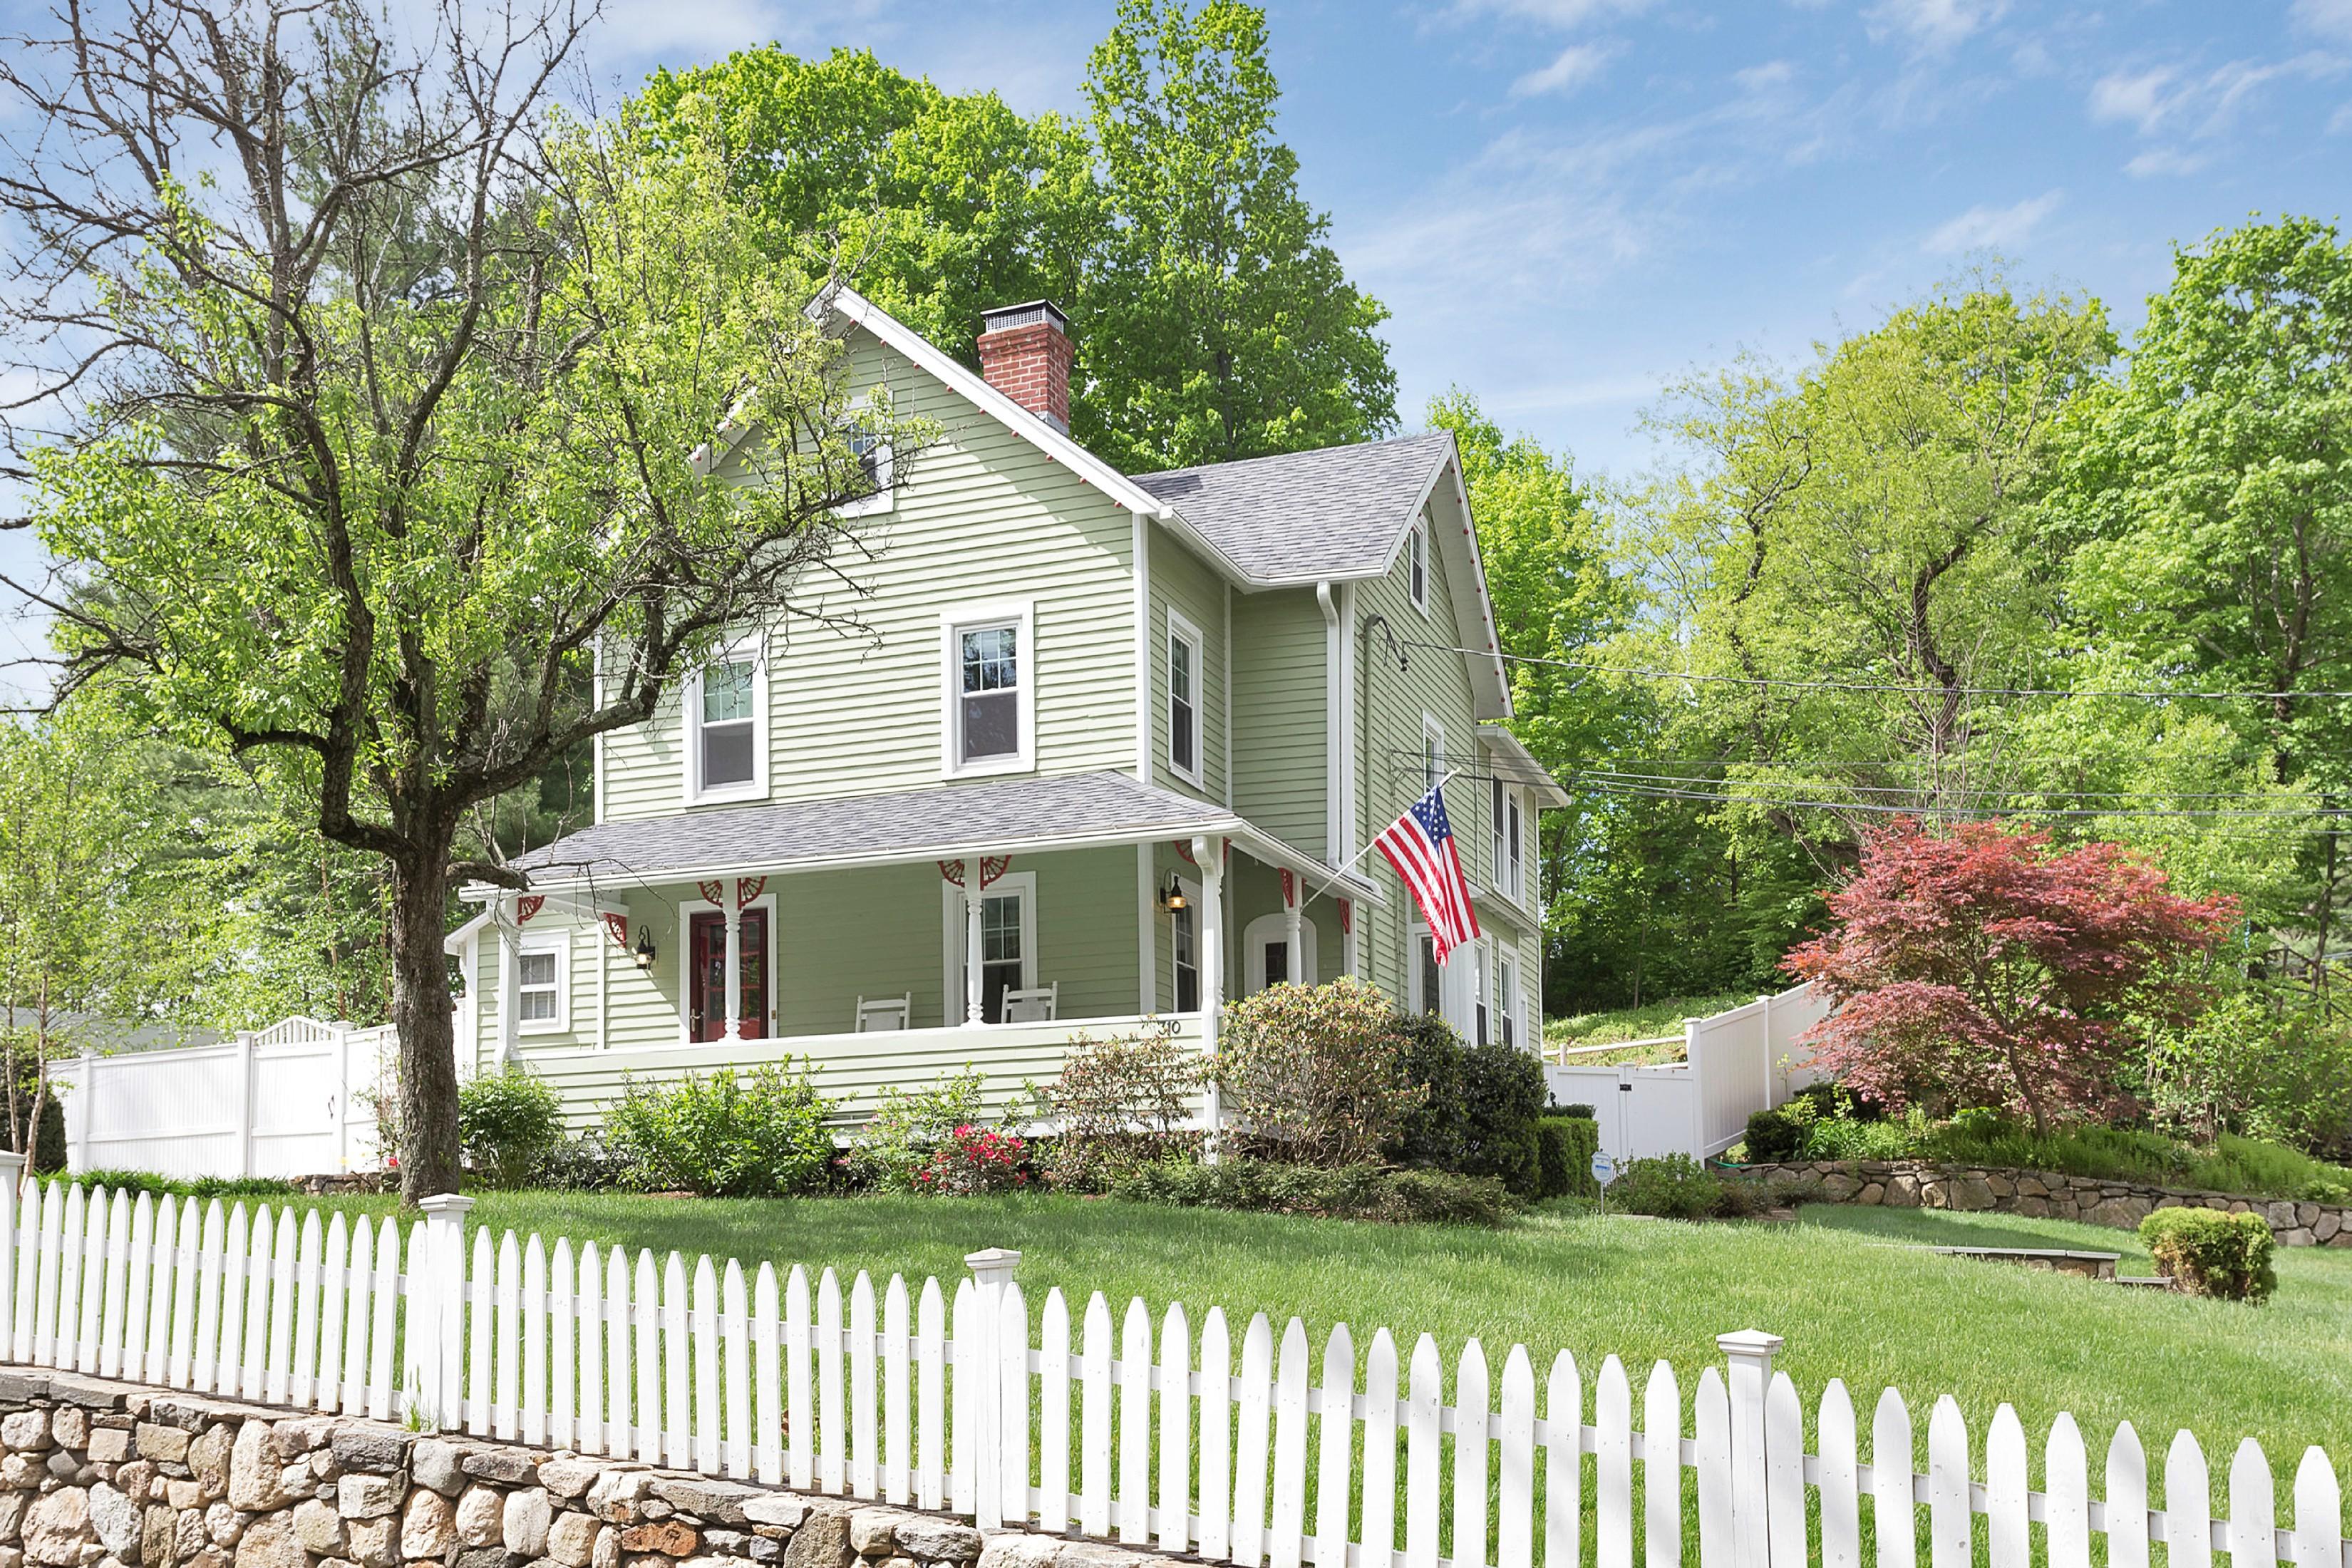 独户住宅 为 销售 在 Enchantingly Victorian 310 Flax Hill Road Norwalk, 康涅狄格州 06854 美国